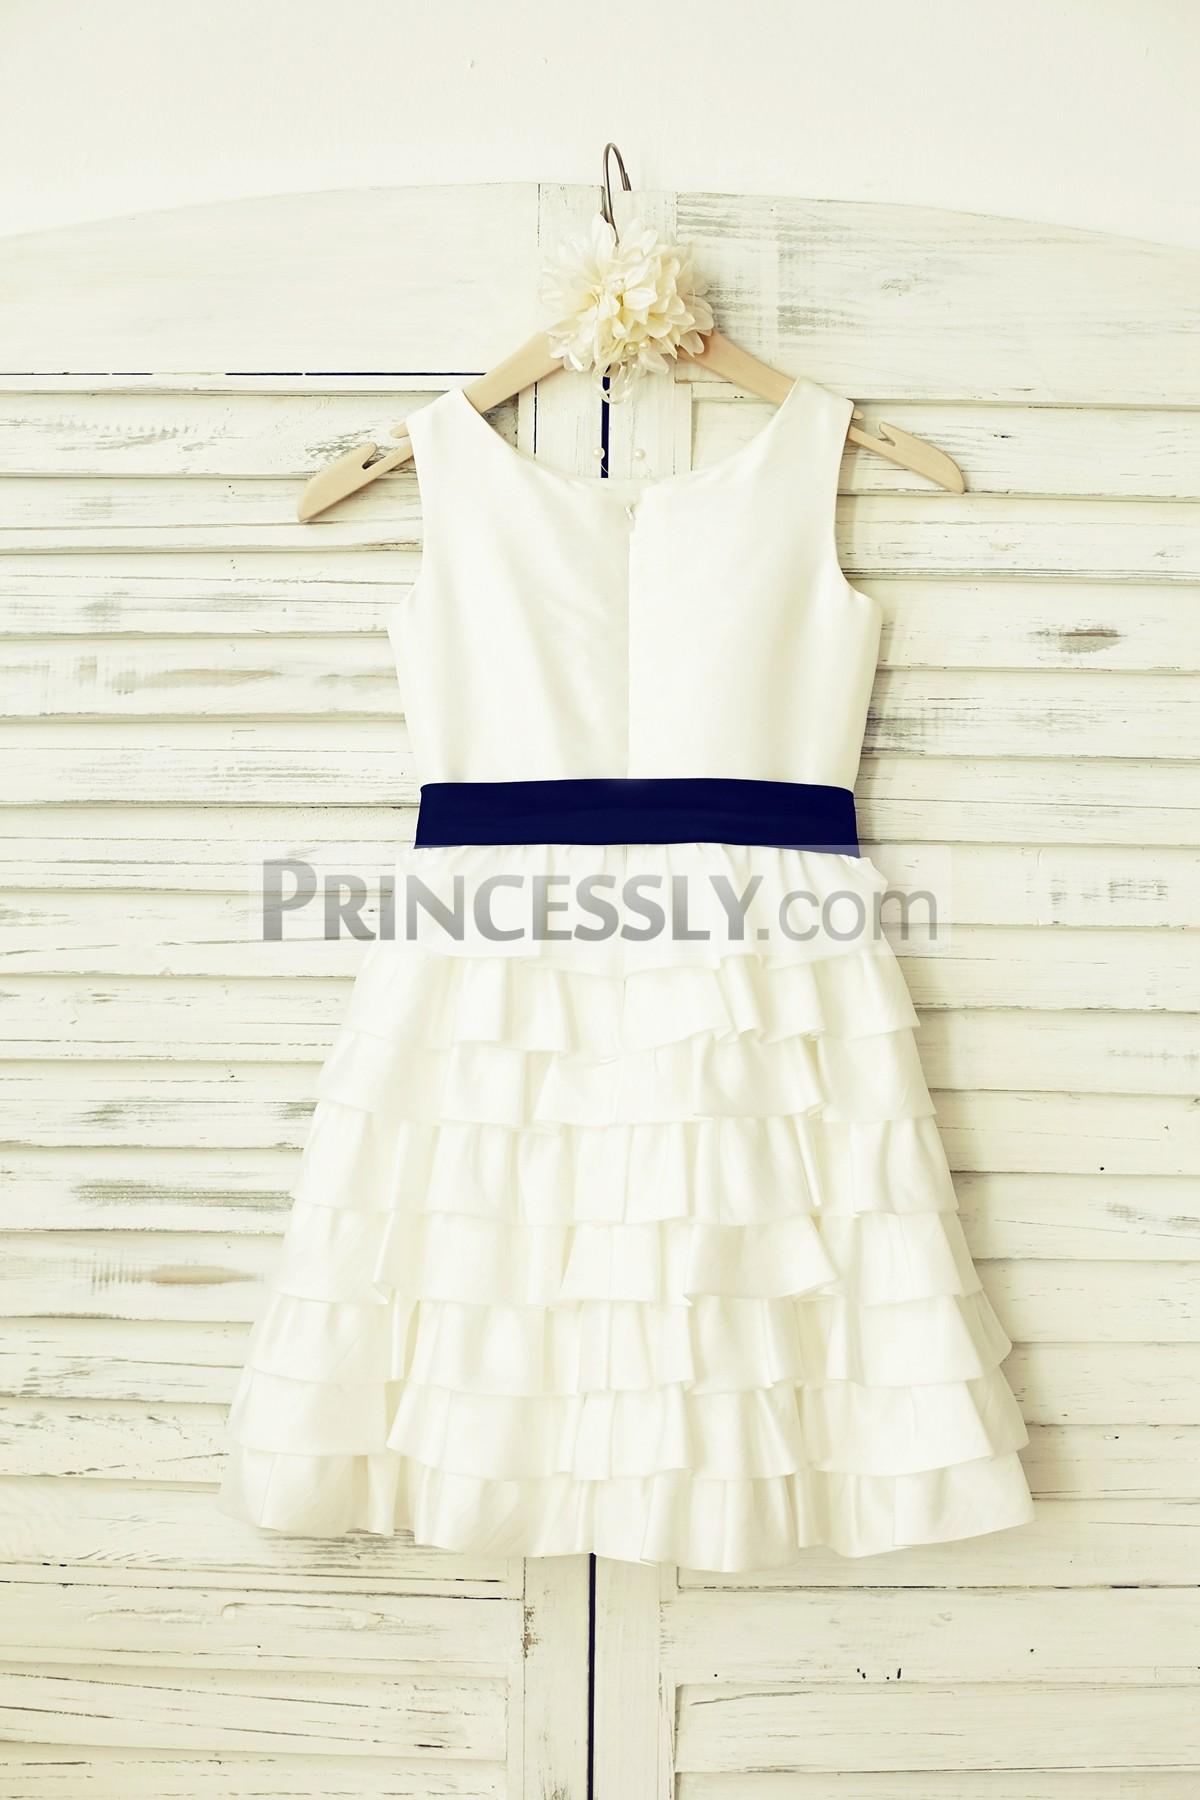 Scoop neck sleeveless ivory taffeta cupcake wedding baby girl dress